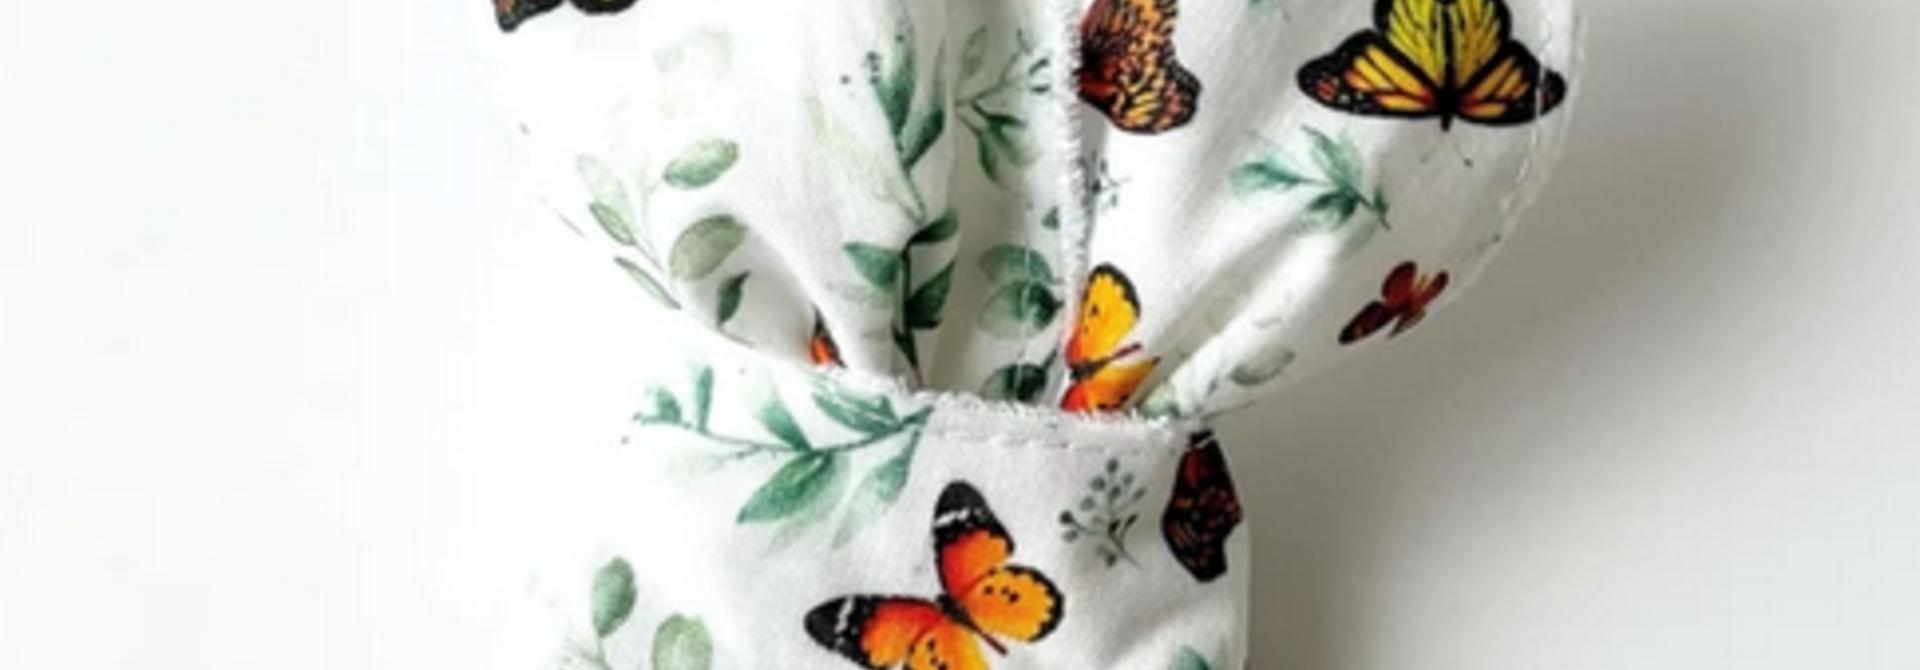 Hochet Oreilles de Lapin - Papillons